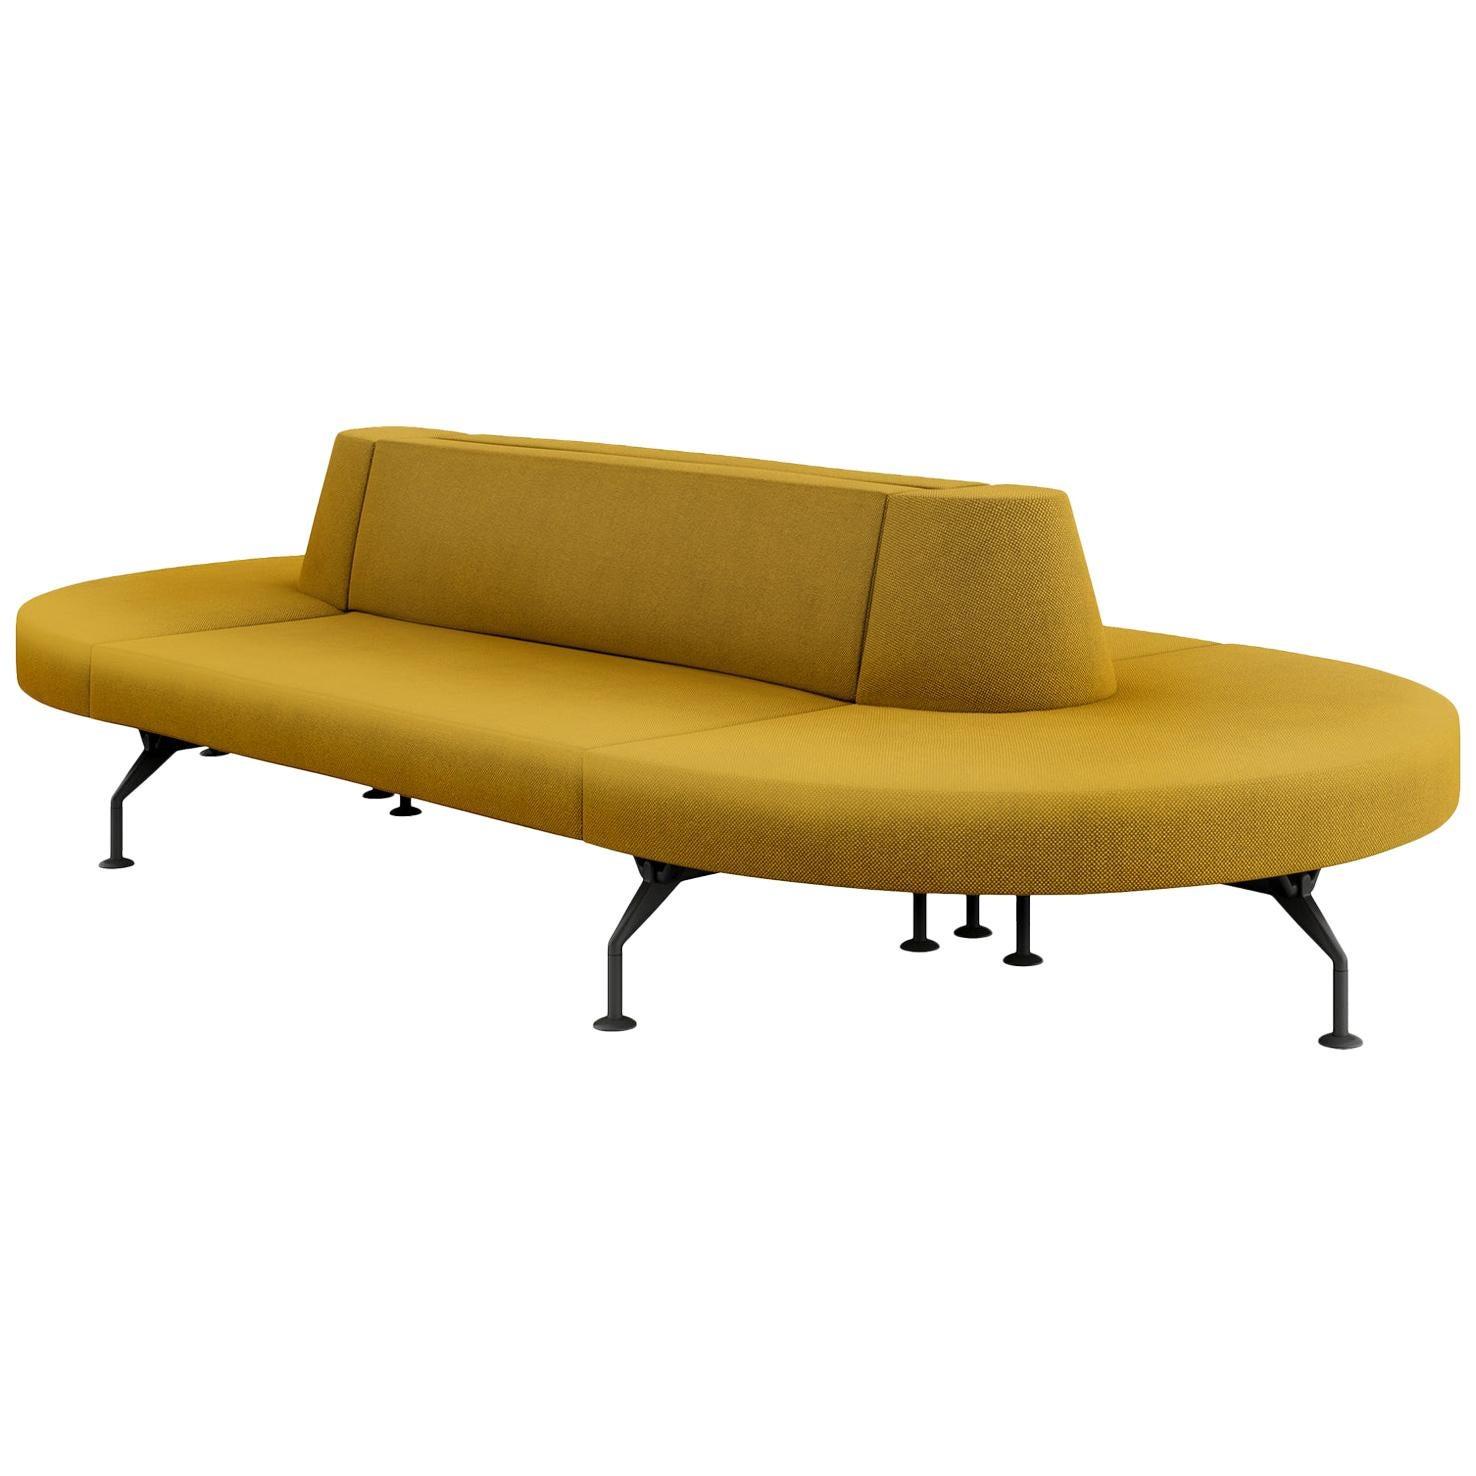 Tacchini Intercity Modular Sofa System in Yellow Fabric by Pietro Arosio